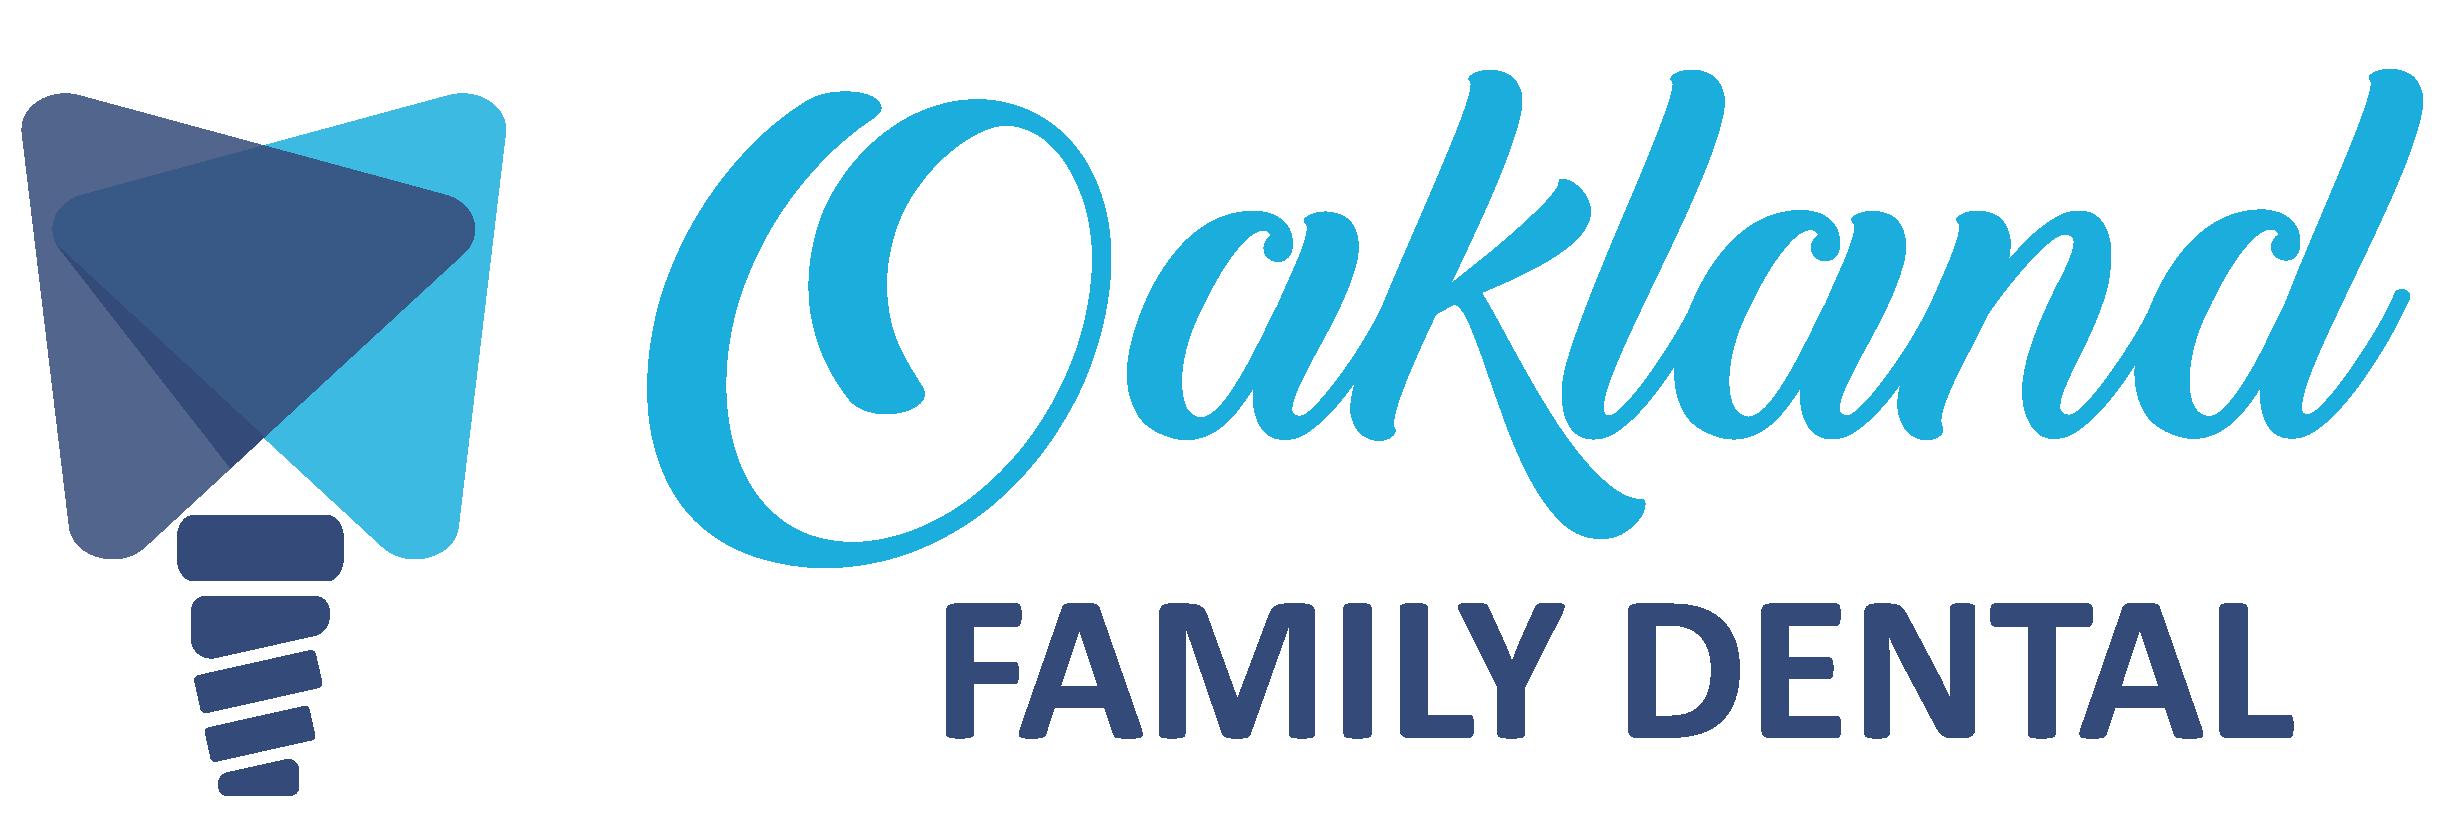 Oakland Family Dental - Vector Logo